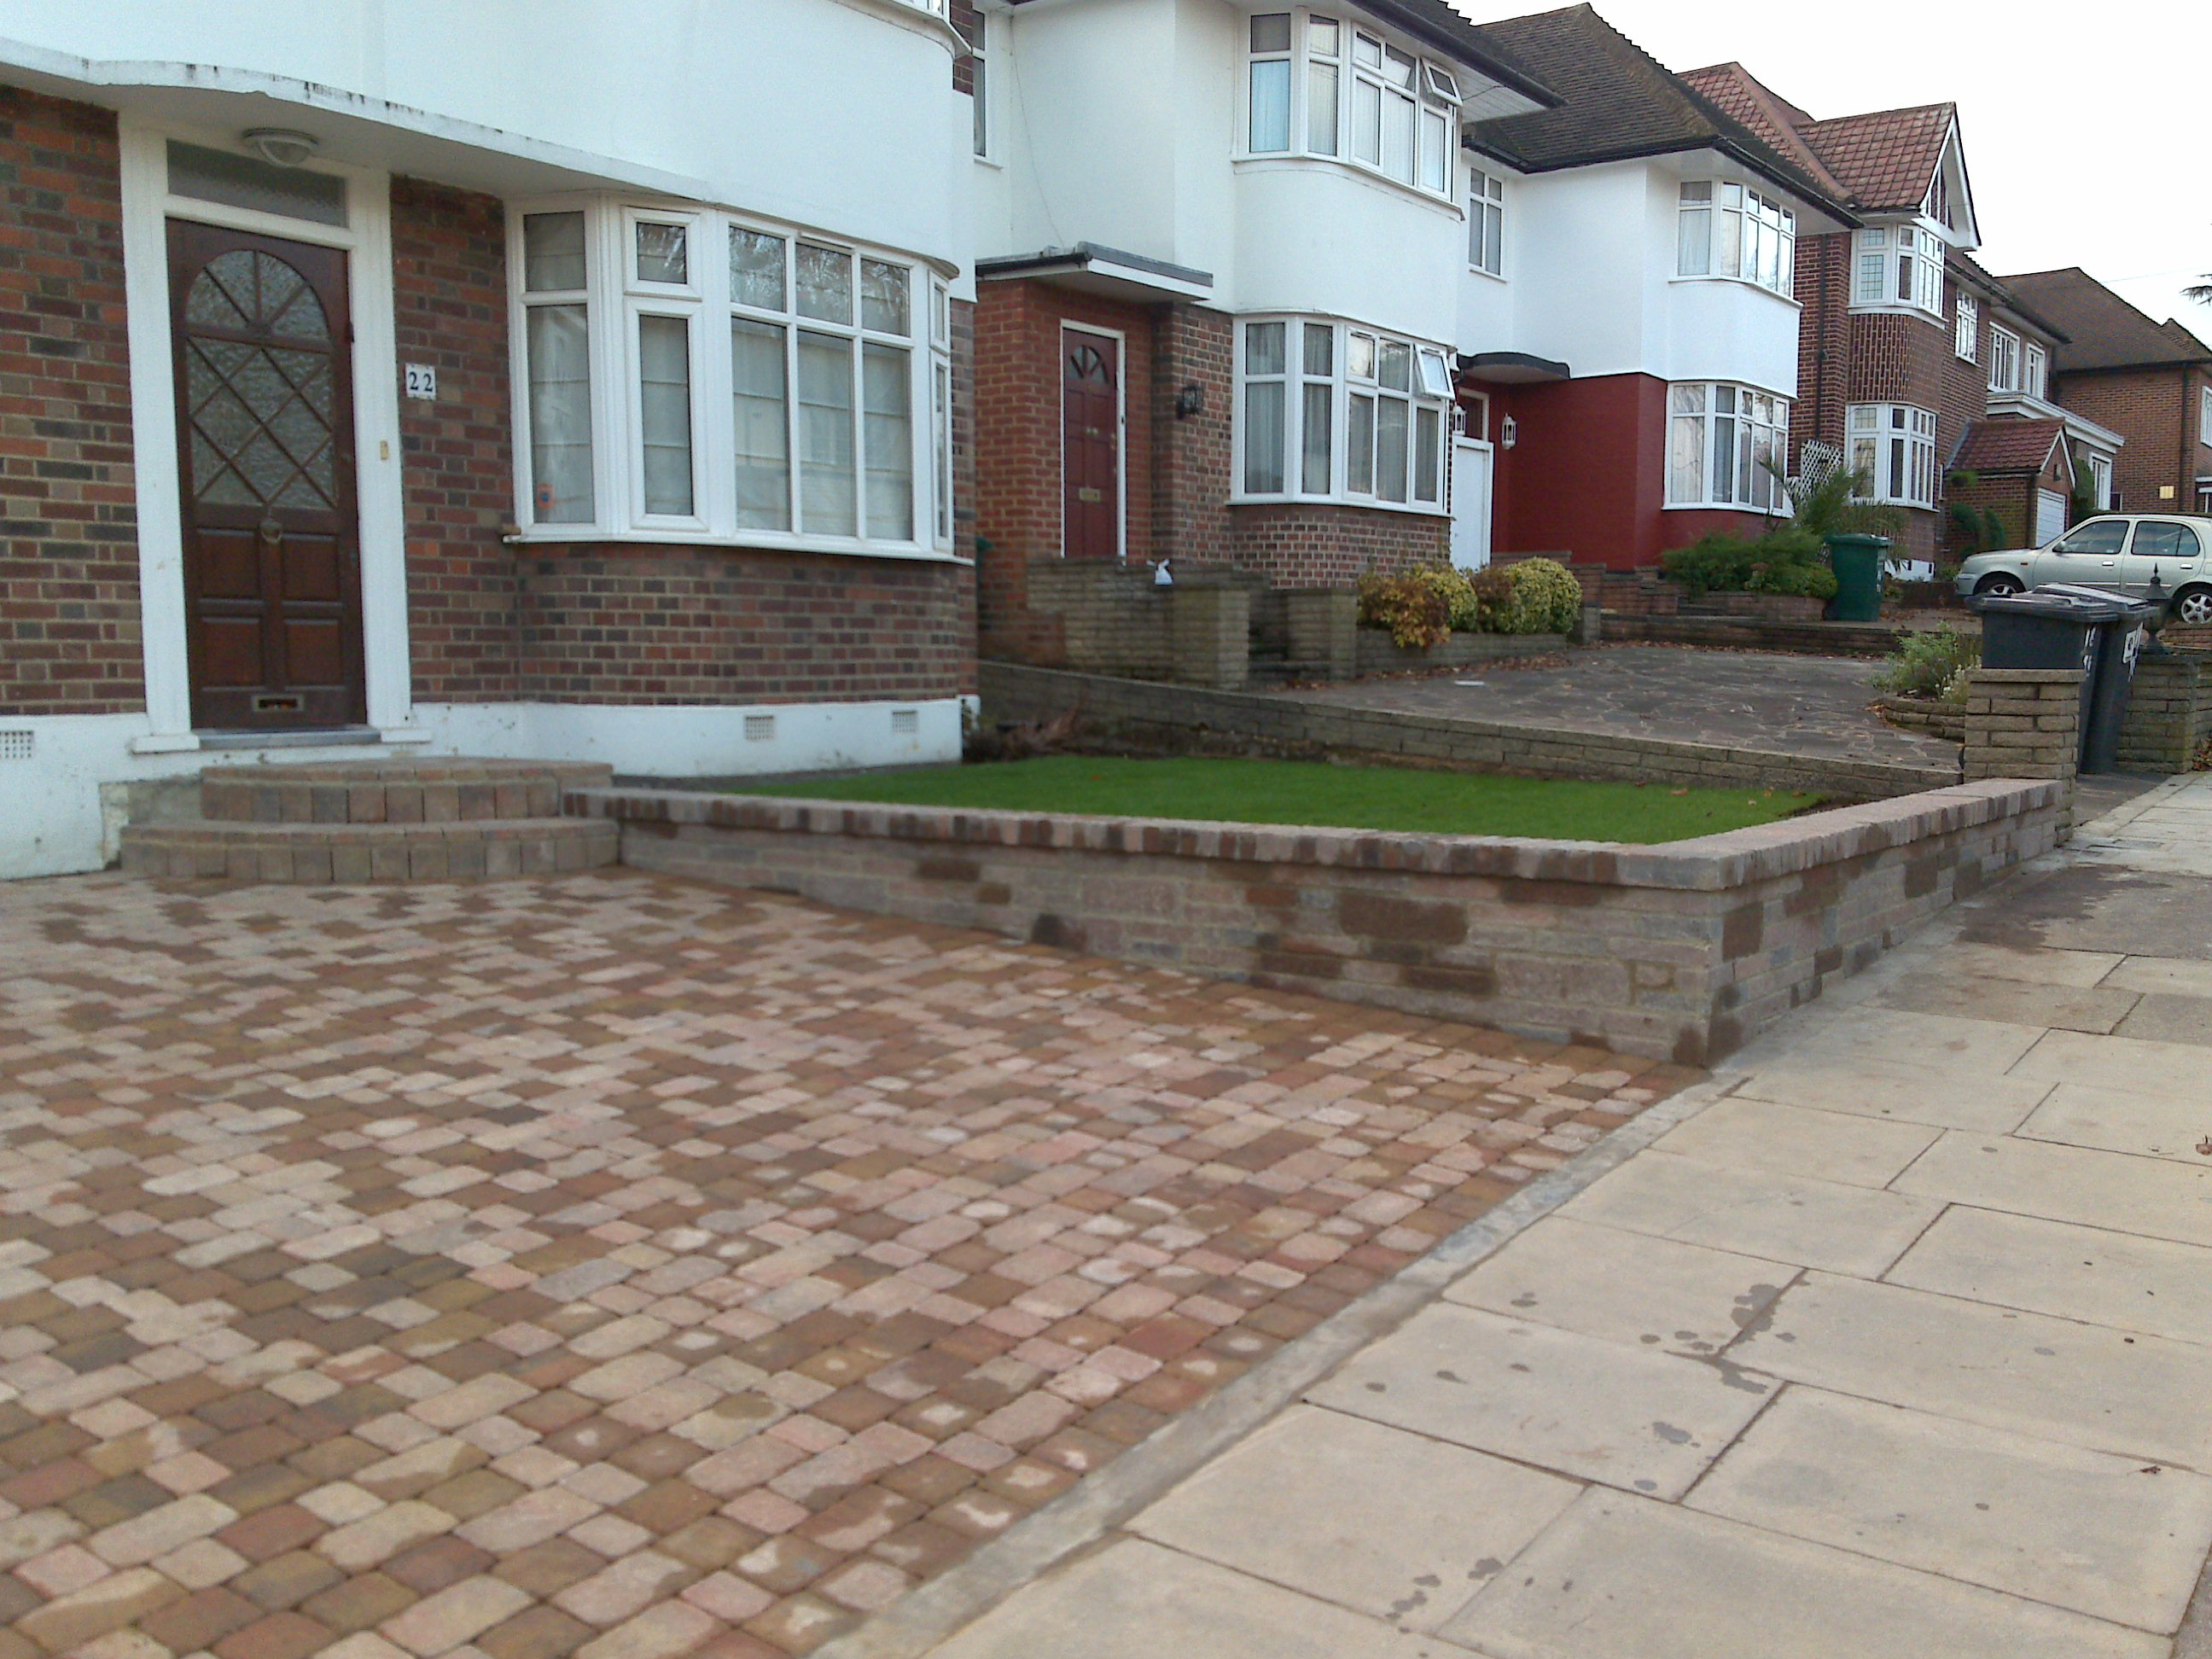 driveway, paving, landscaping, lawn